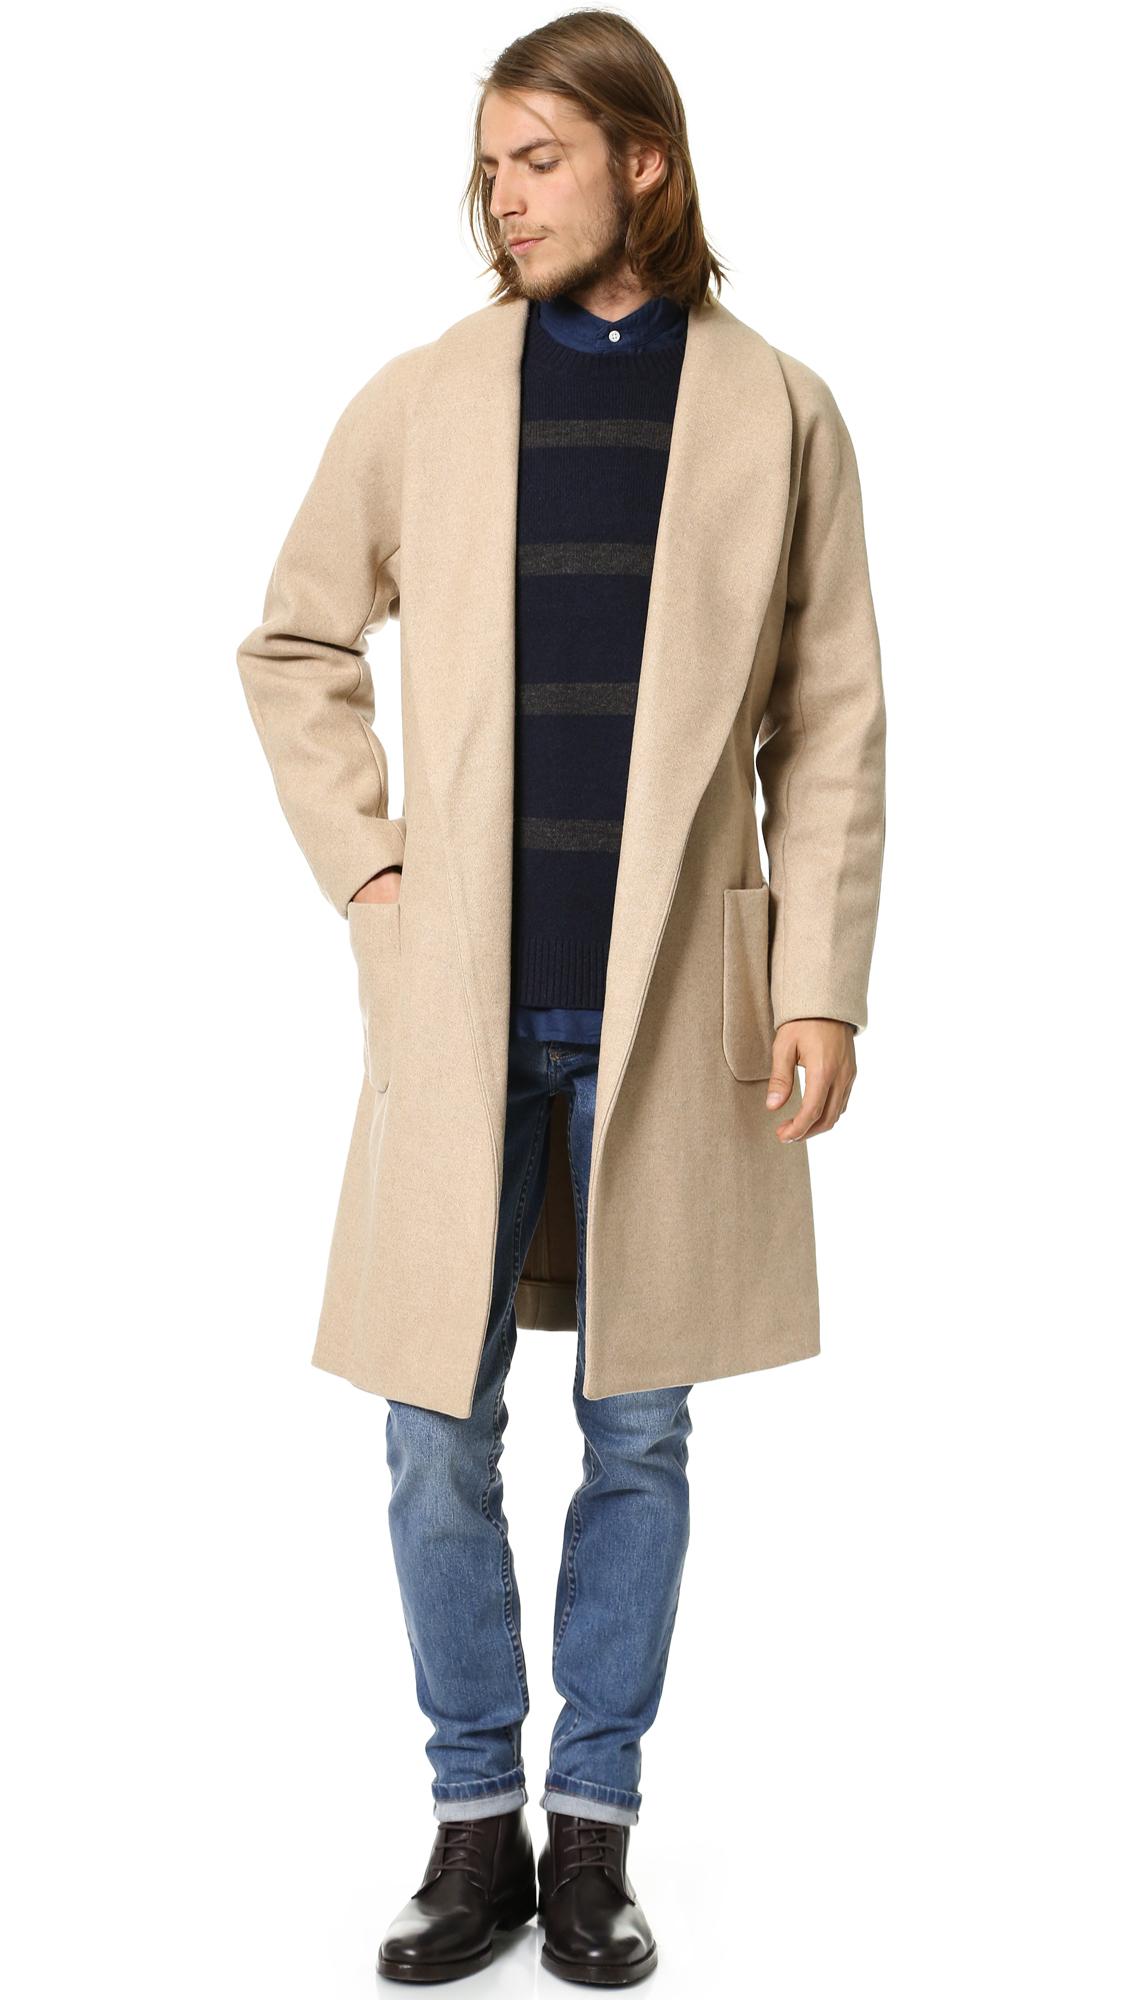 a p c robe coat in natural for men lyst. Black Bedroom Furniture Sets. Home Design Ideas